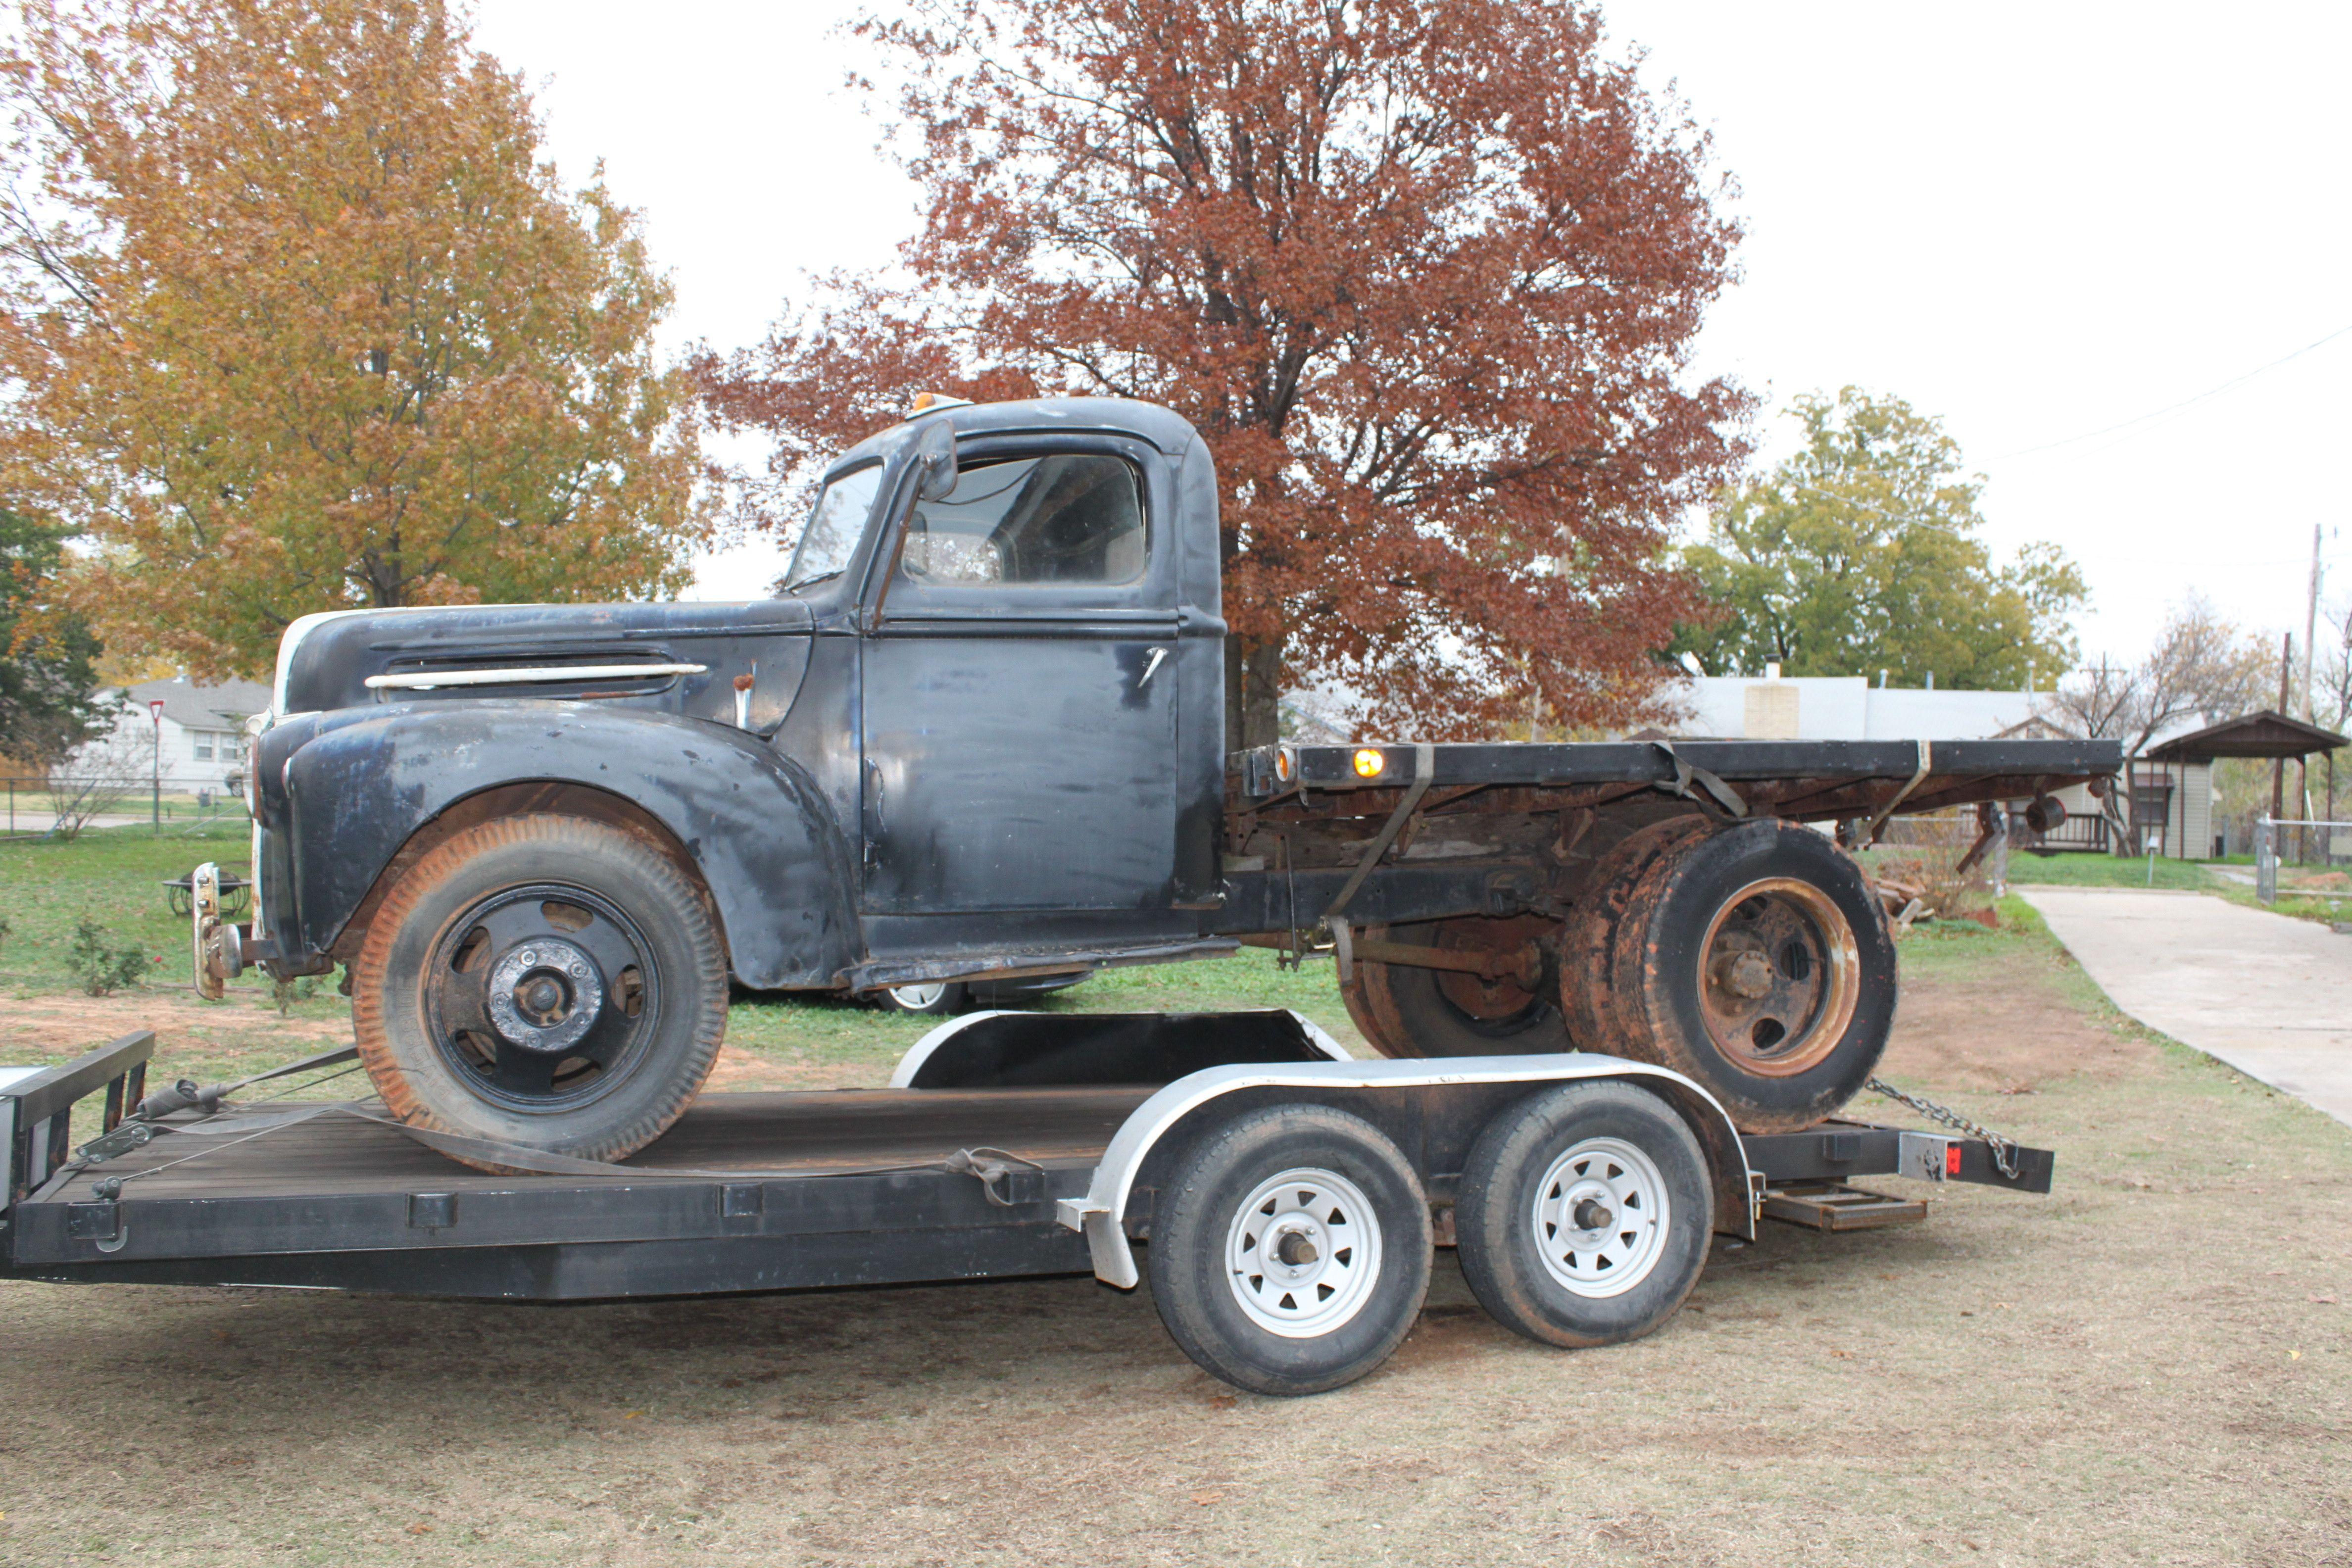 Bagged Gmc 1942 Chevy Truck Patina Pin Ryan Rnning On Ford Pinterest 4752x3168